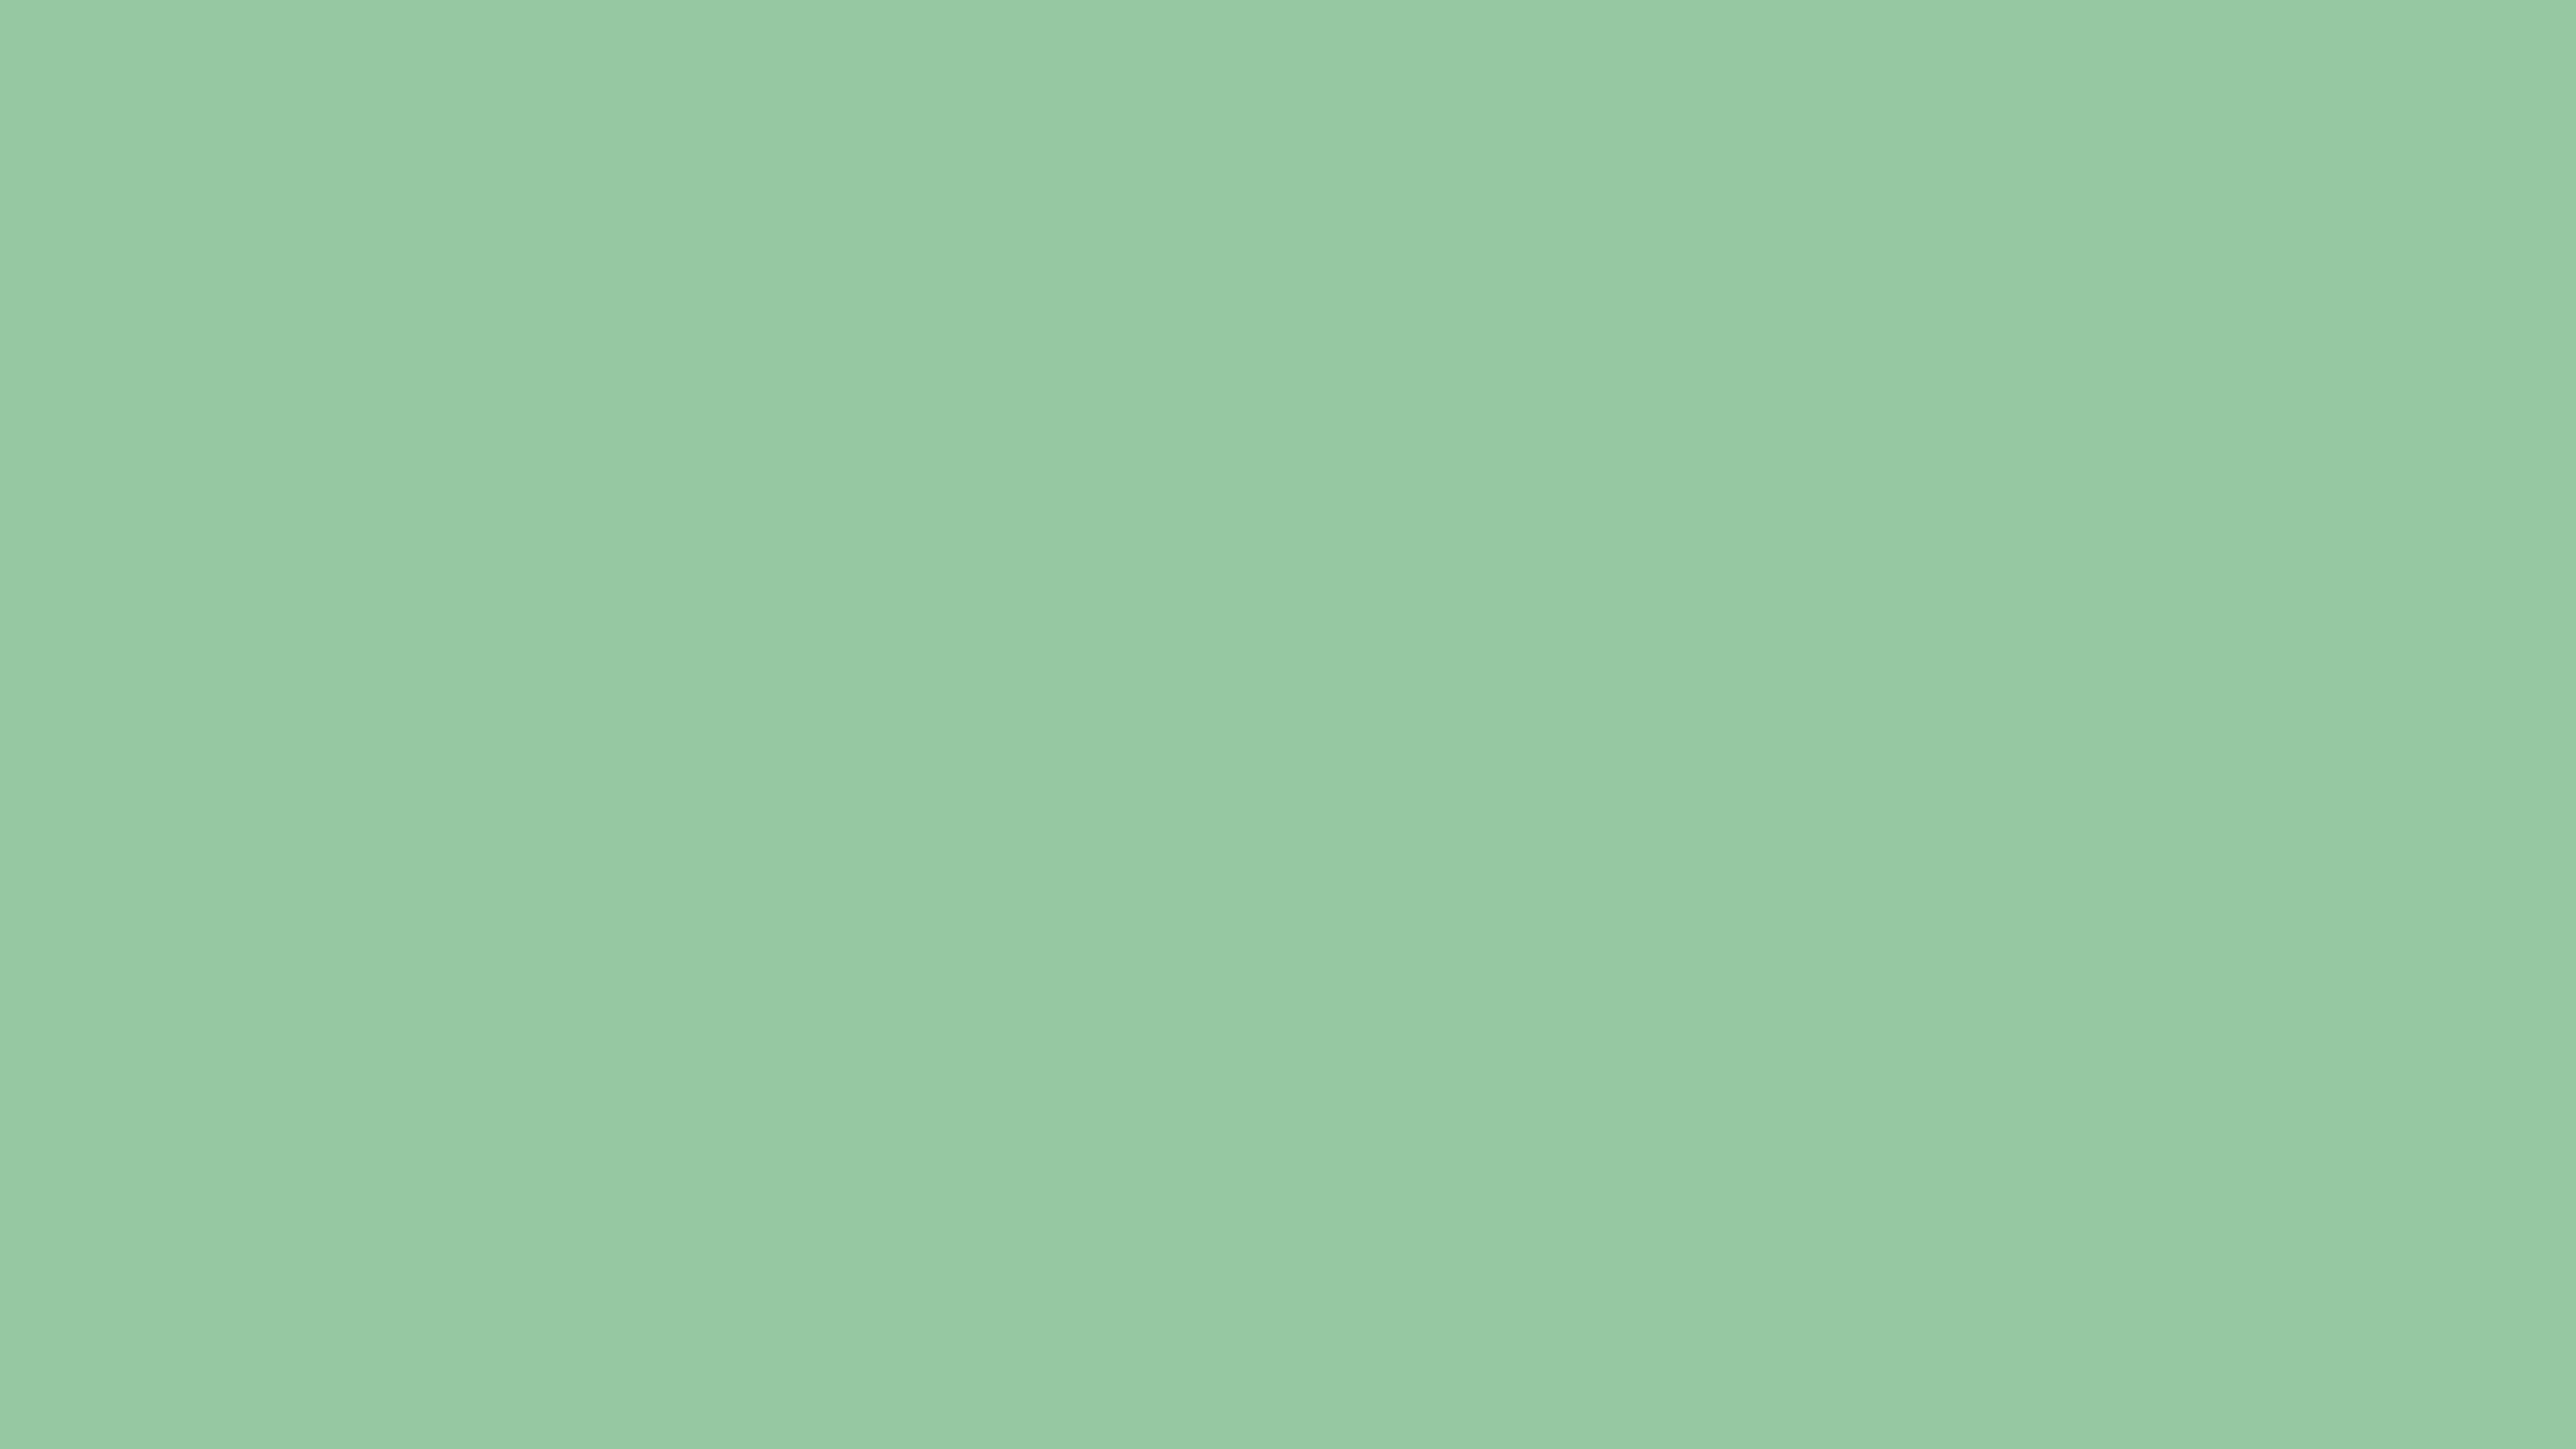 4096x2304 Eton Blue Solid Color Background